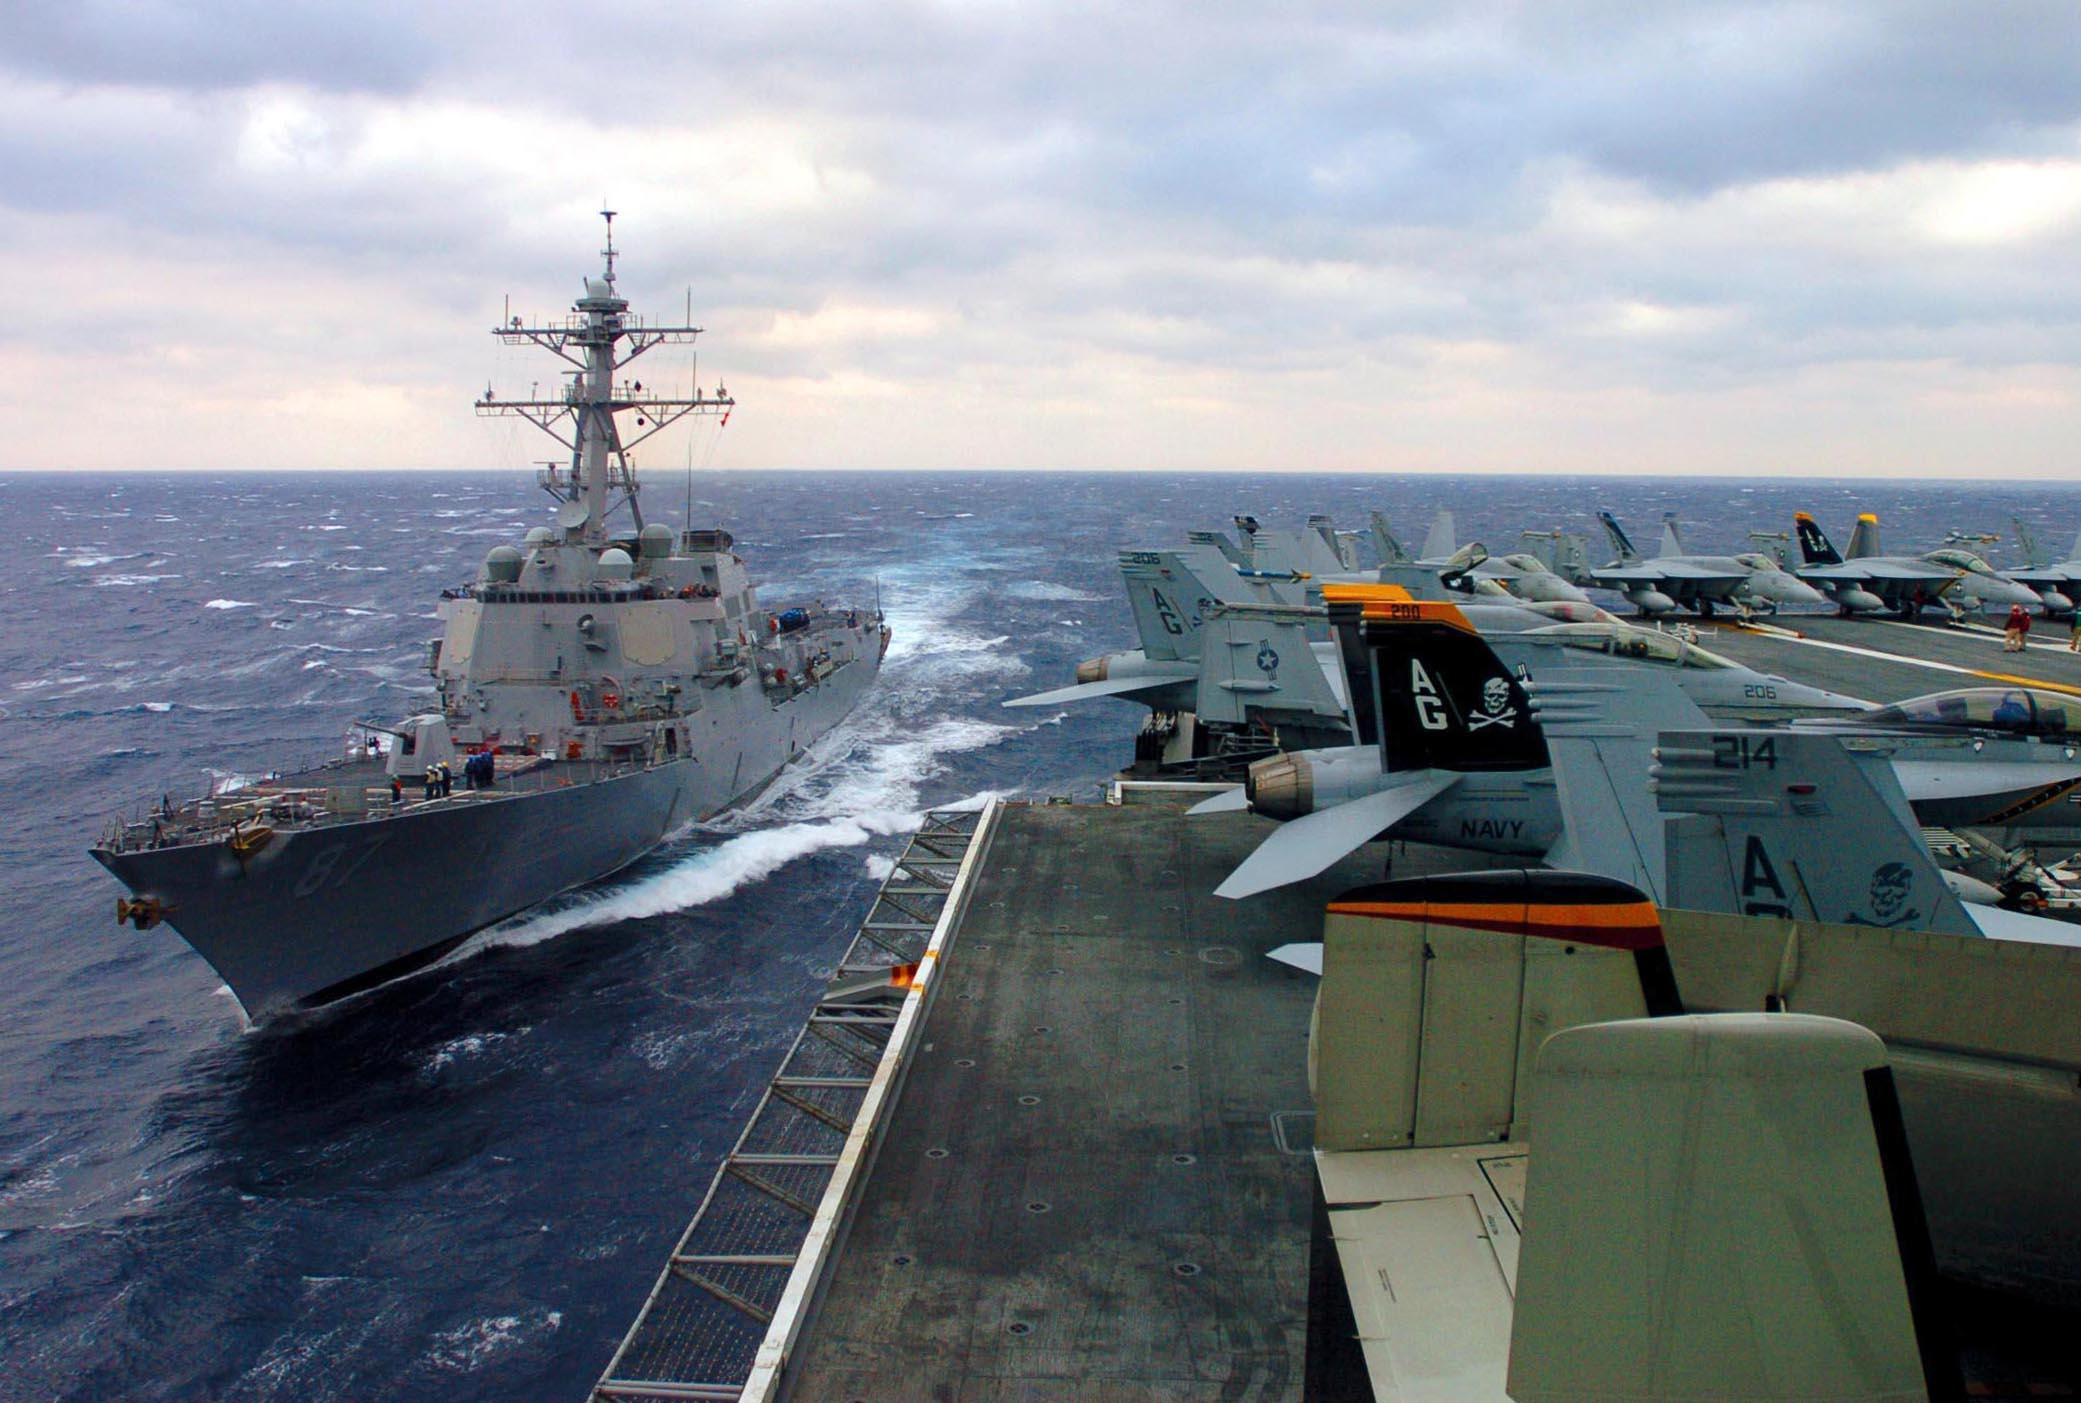 Port_bow_view_of_USS_Mason_%28DDG-87%29_coming_alongside_USS_Dwight_D._Eisenhower_%28CVN-69%29_for_underway_replenishment_060219-N-9174G-001.jpg